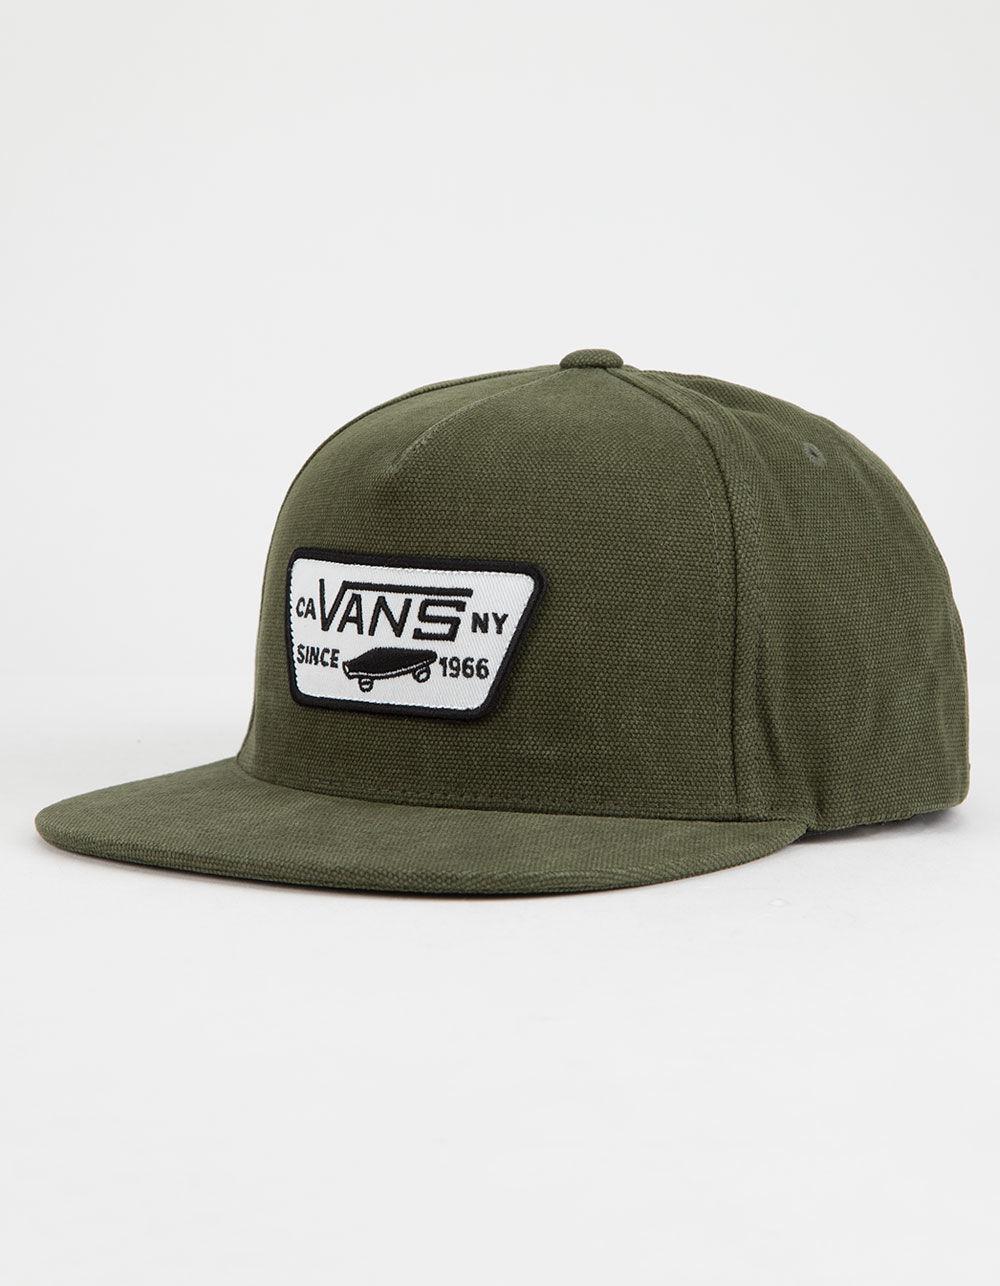 Lyst - Vans Full Patch Green Mens Snapback Hat in Green for Men 085569bdc66